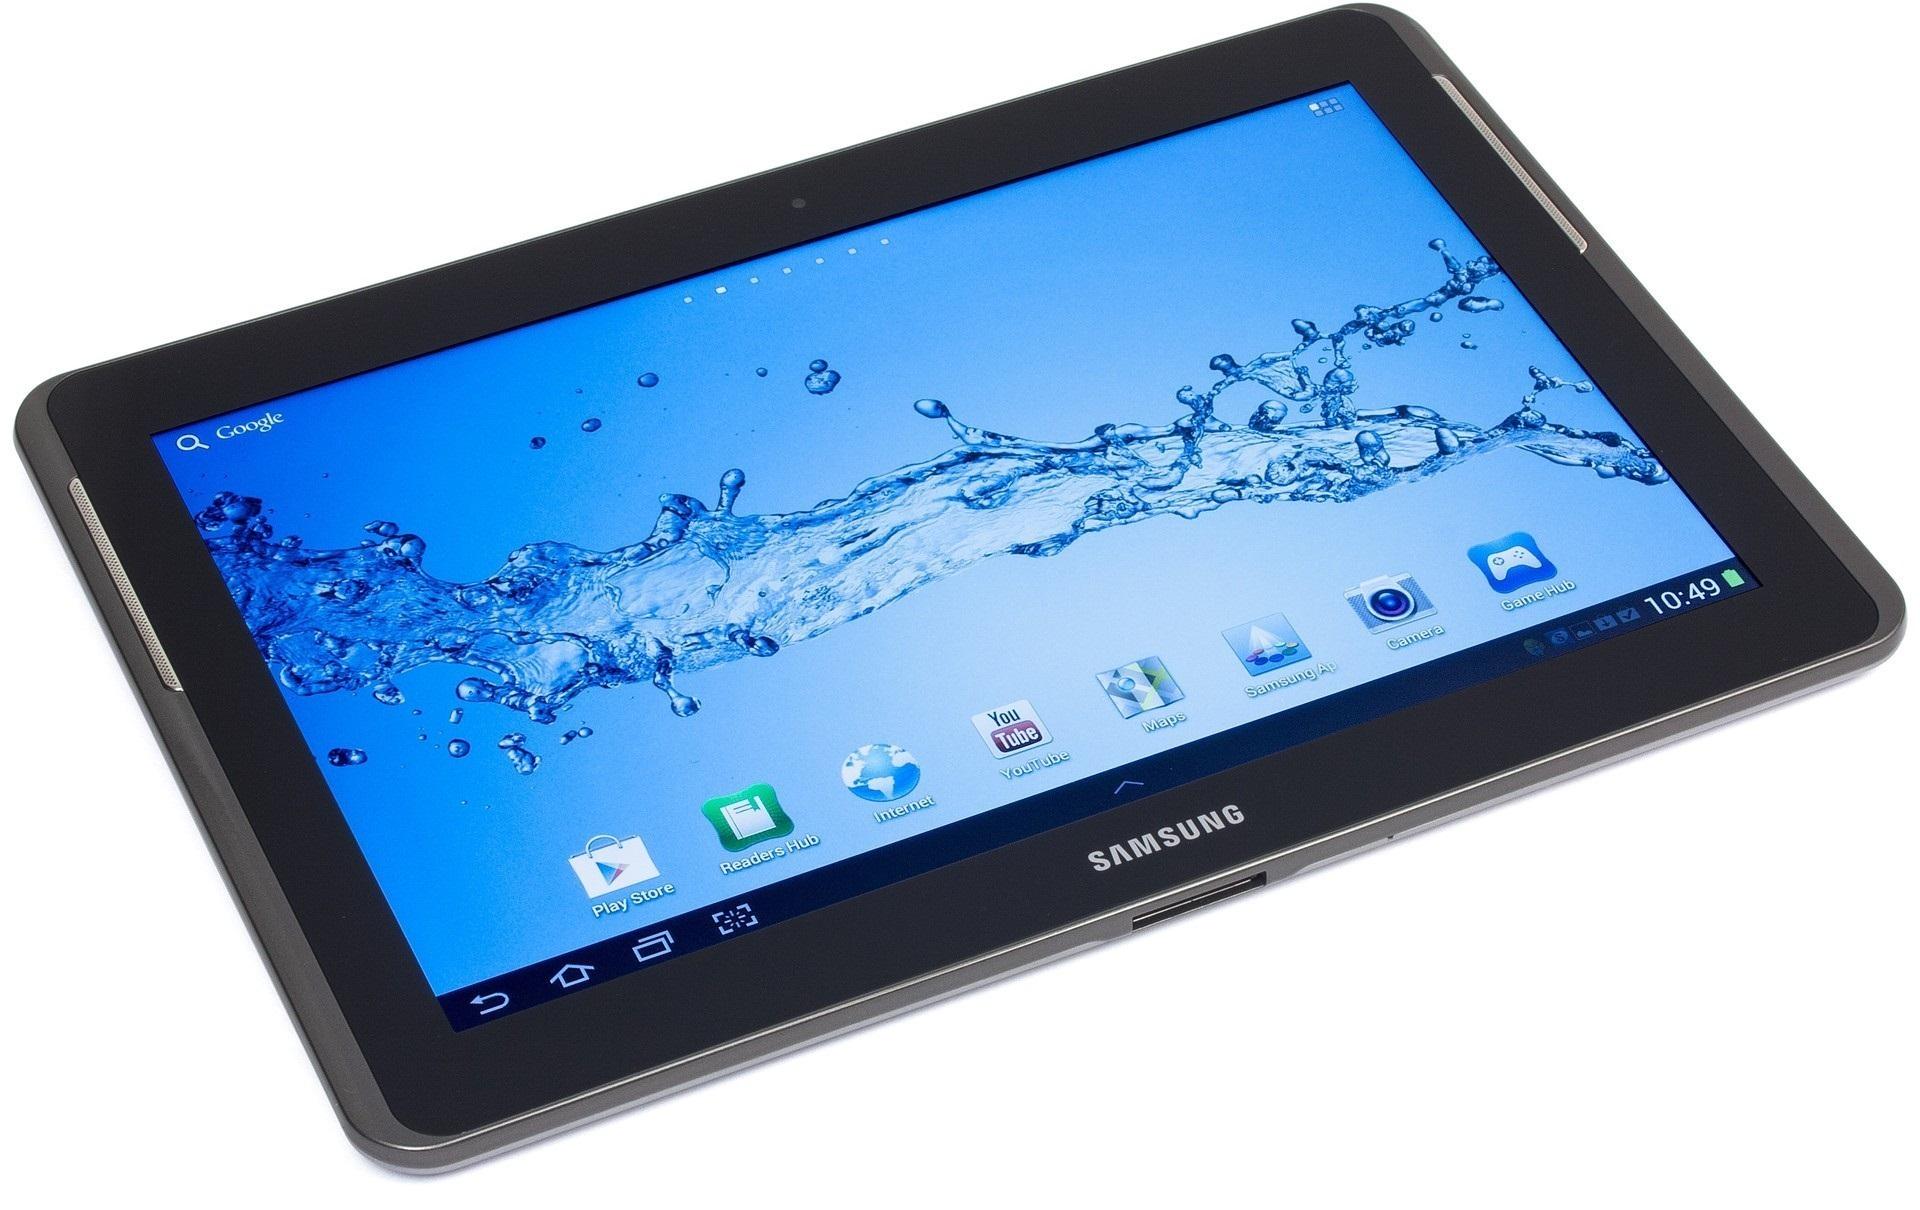 Samsung Tablet   Pictures Pics Photos Images Wallpapers Desktop 1920x1210